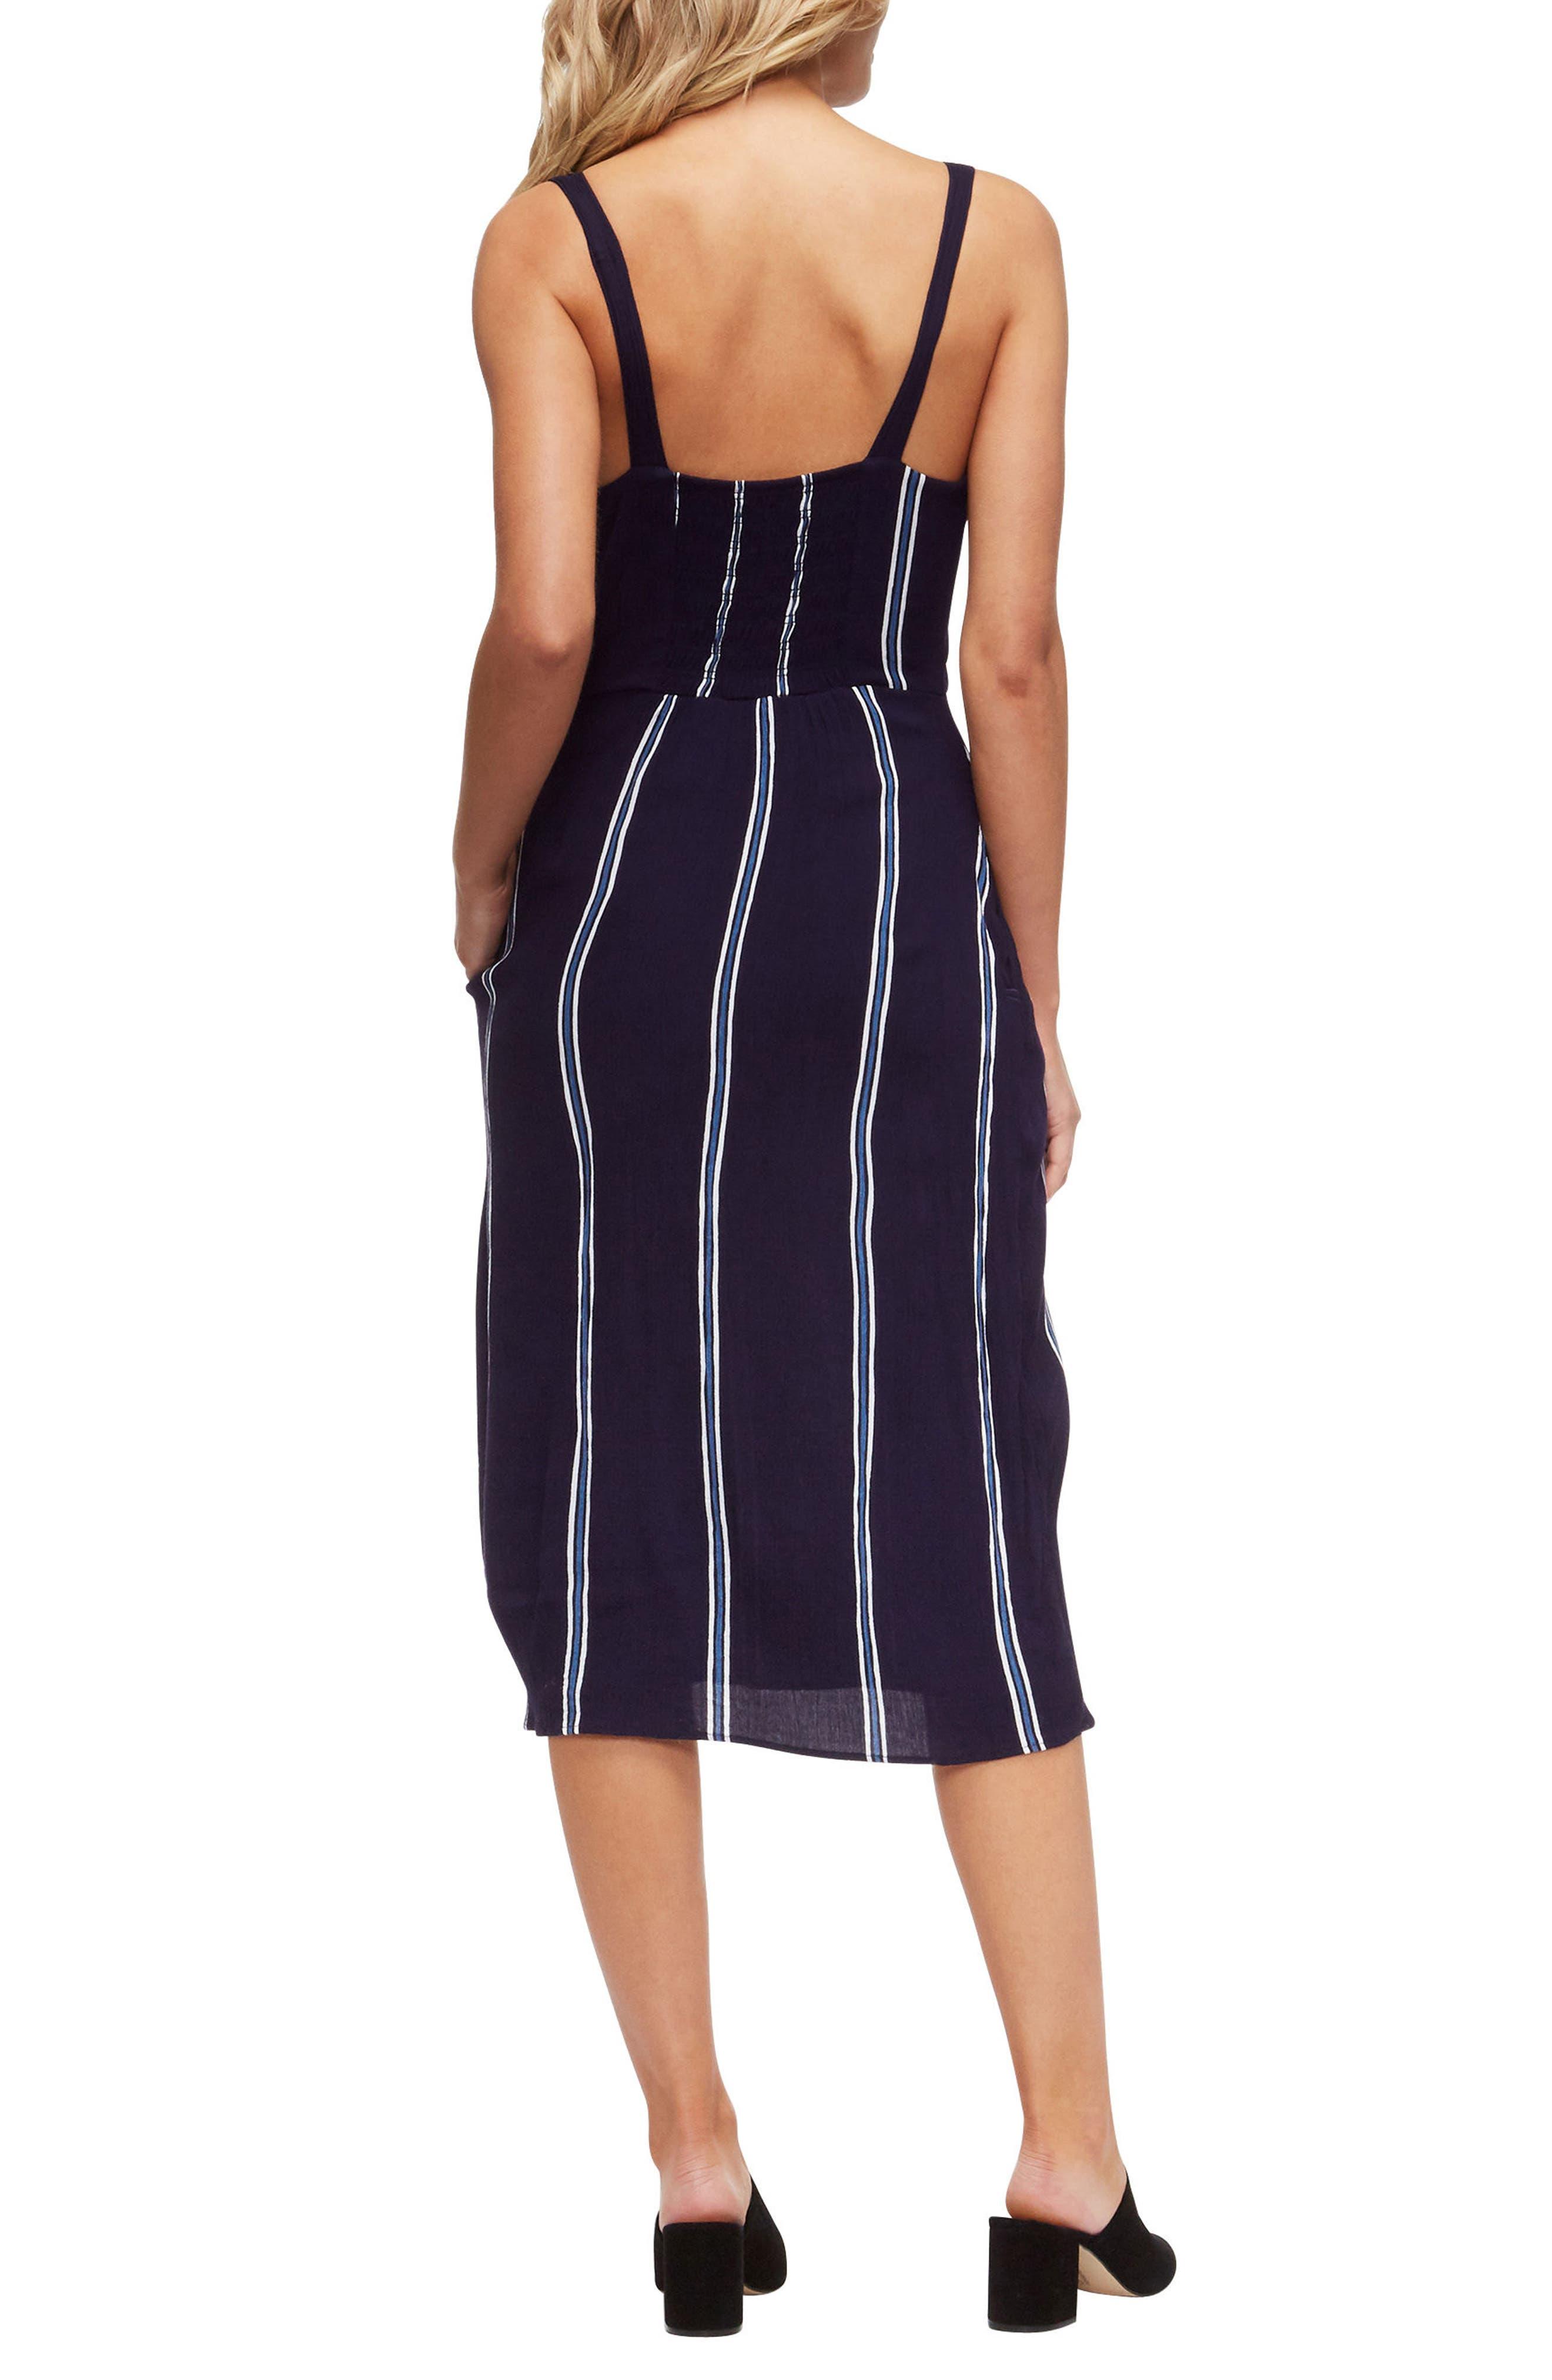 Geni Cover-Up Dress,                             Alternate thumbnail 2, color,                             Evening Blue/White Stripe